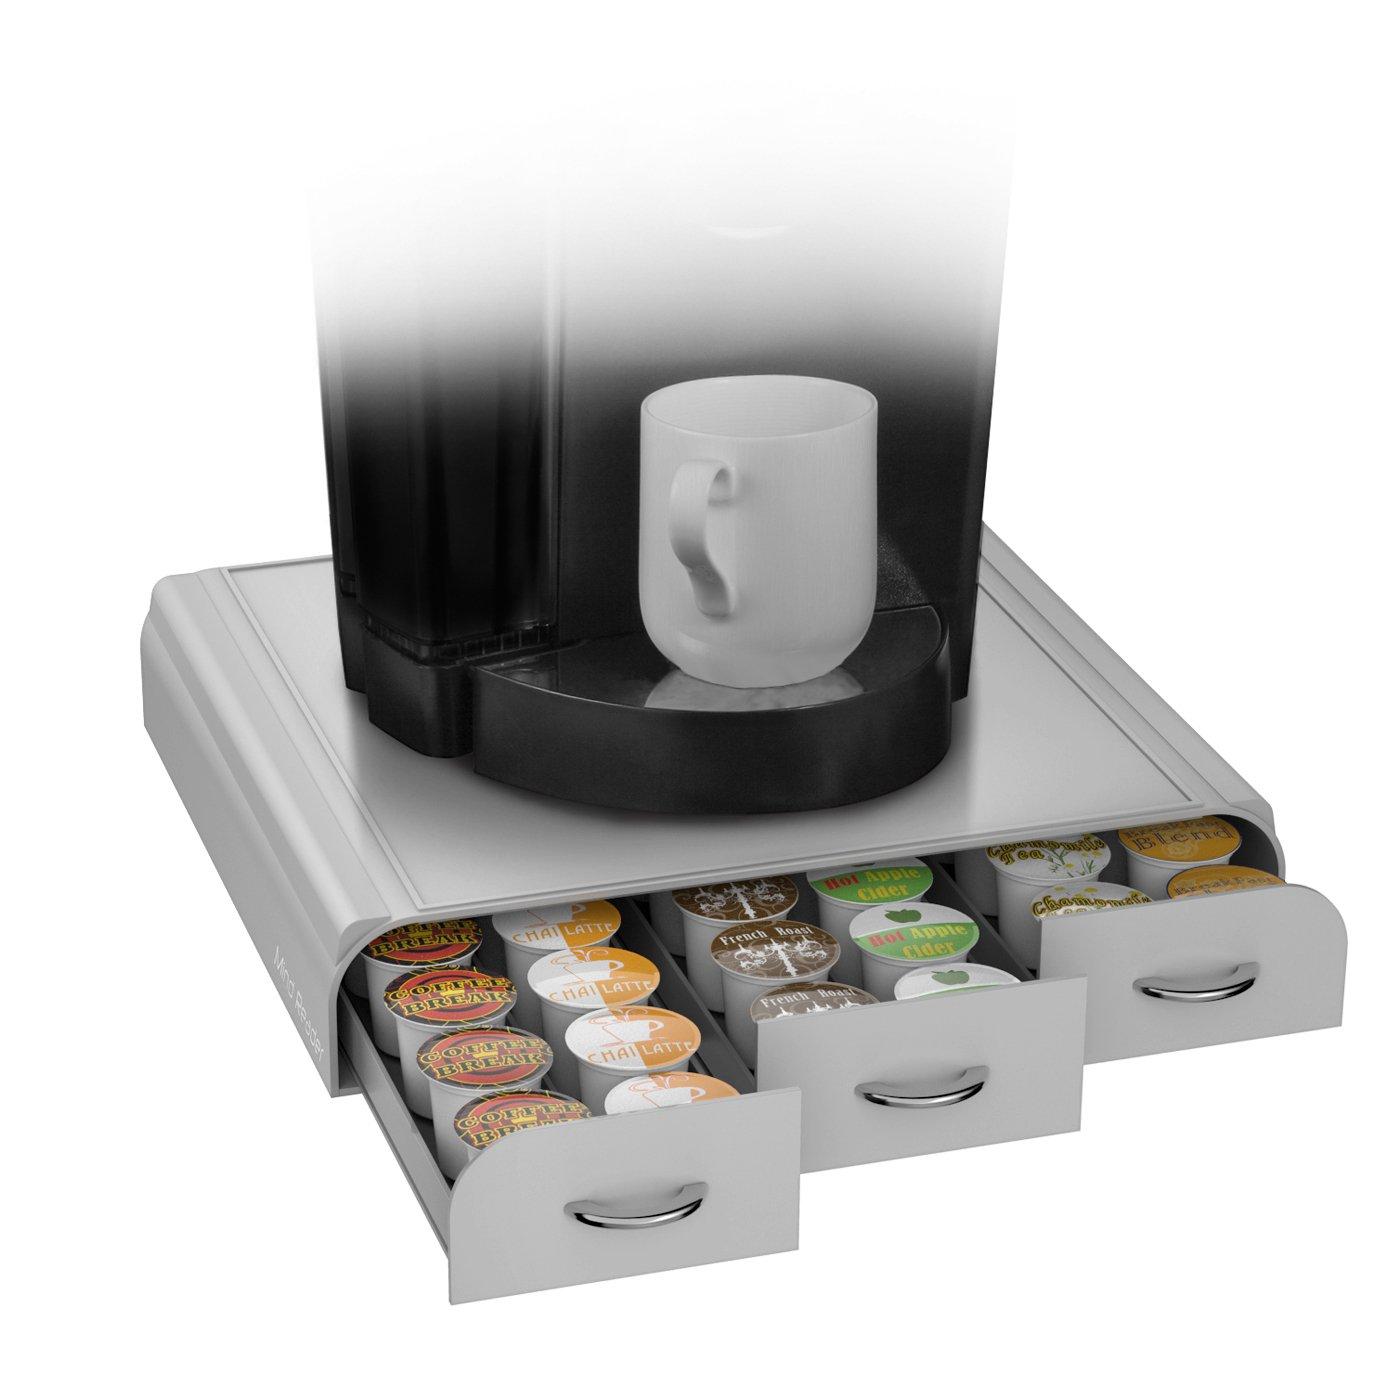 Mind Reader 36 Capacity K-Cup, Dolce Gusto, CBTL, Verismo, Single Serve Coffee Pod Holder Drawer, Gray